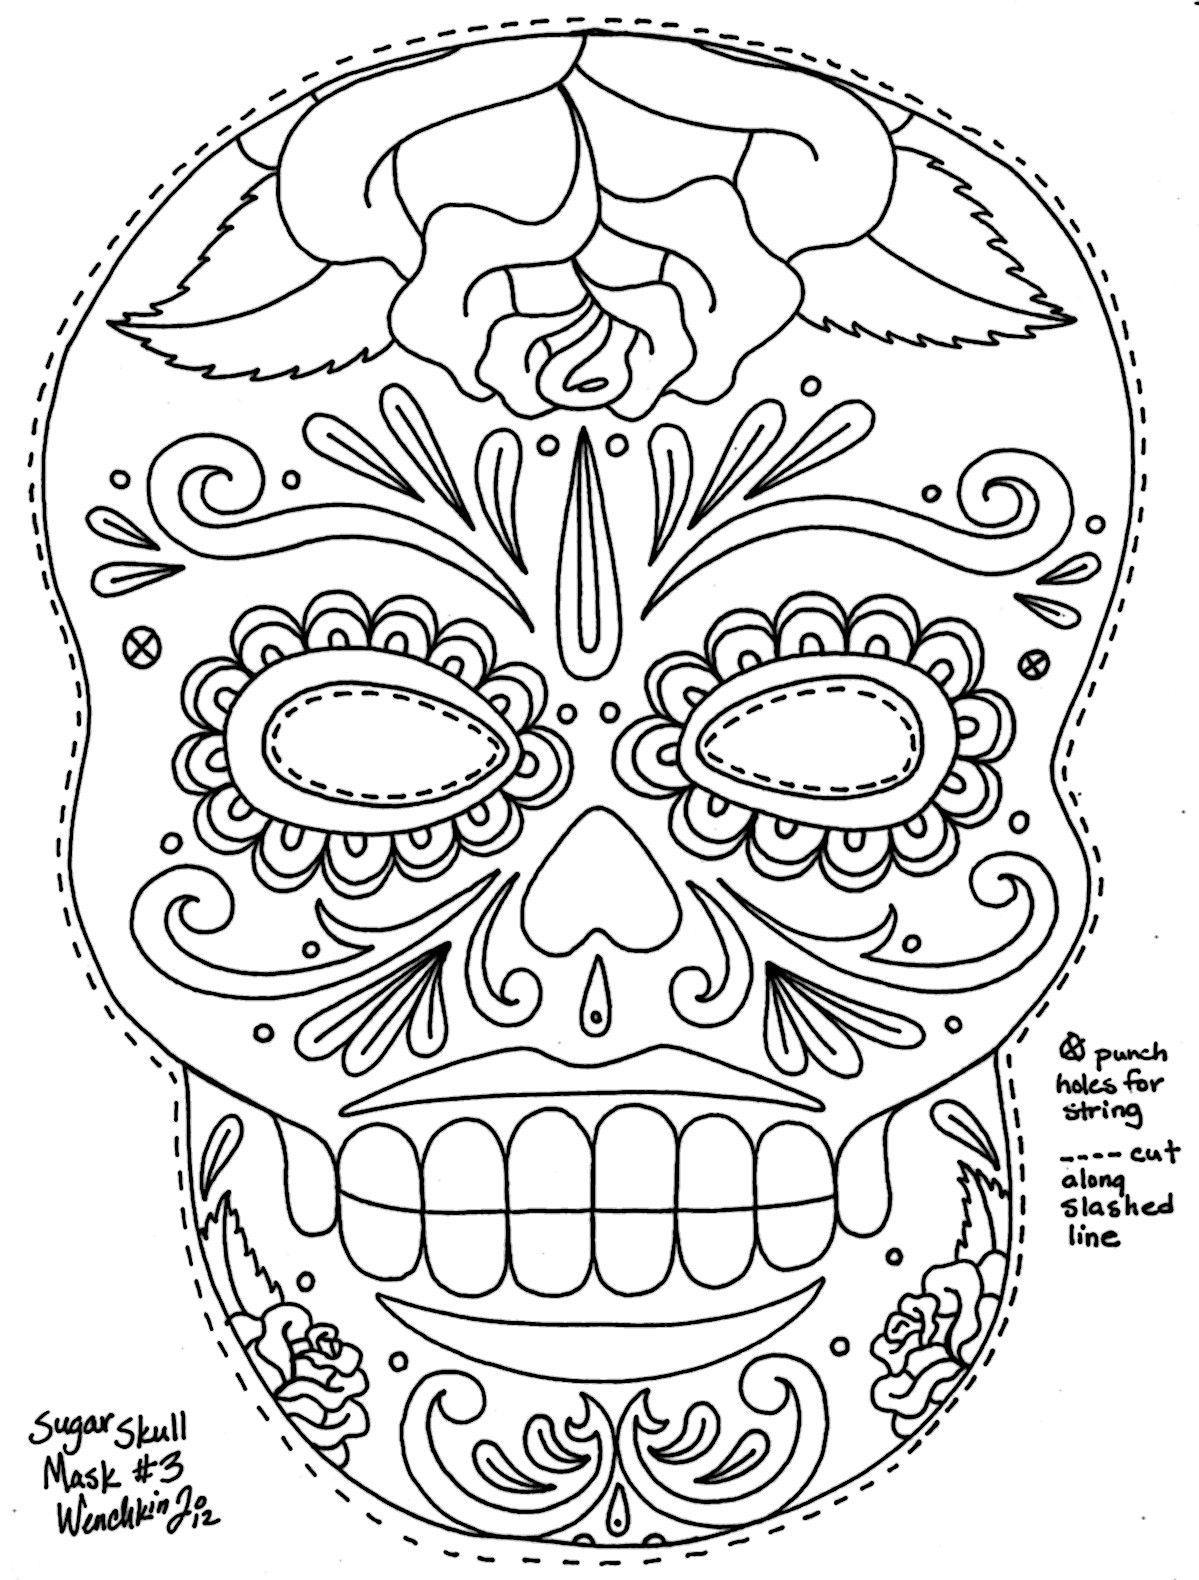 Day Of The Dead Masks Coloring Pages Dia De Los Muertos Kleurplaten Kleurpotloden Knutselen Carnaval